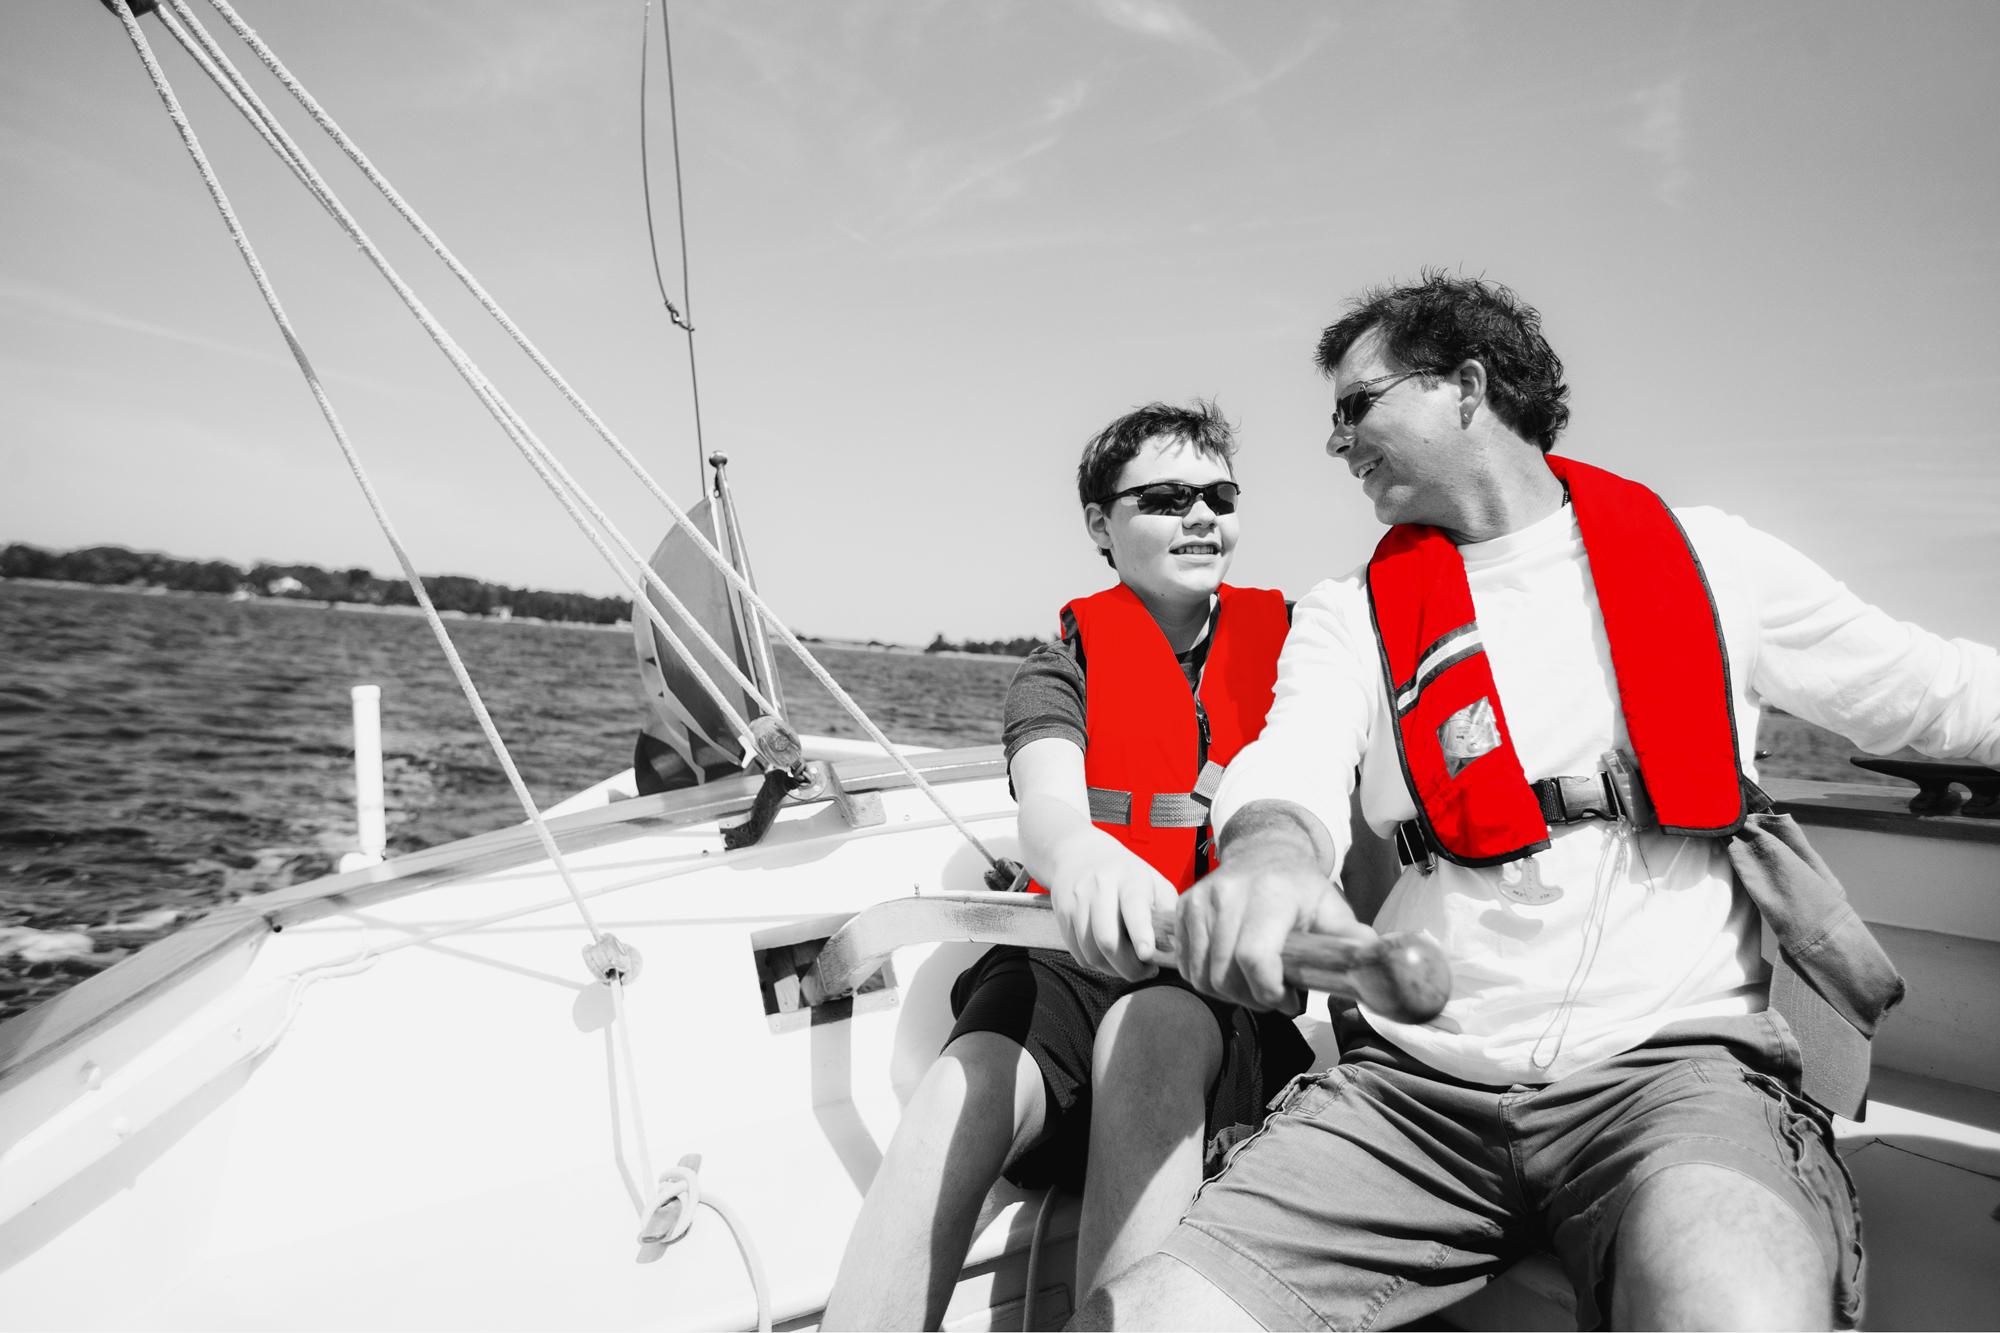 Kimiko-Zoellner AAA Insurance Agency - boat insurance image - cover